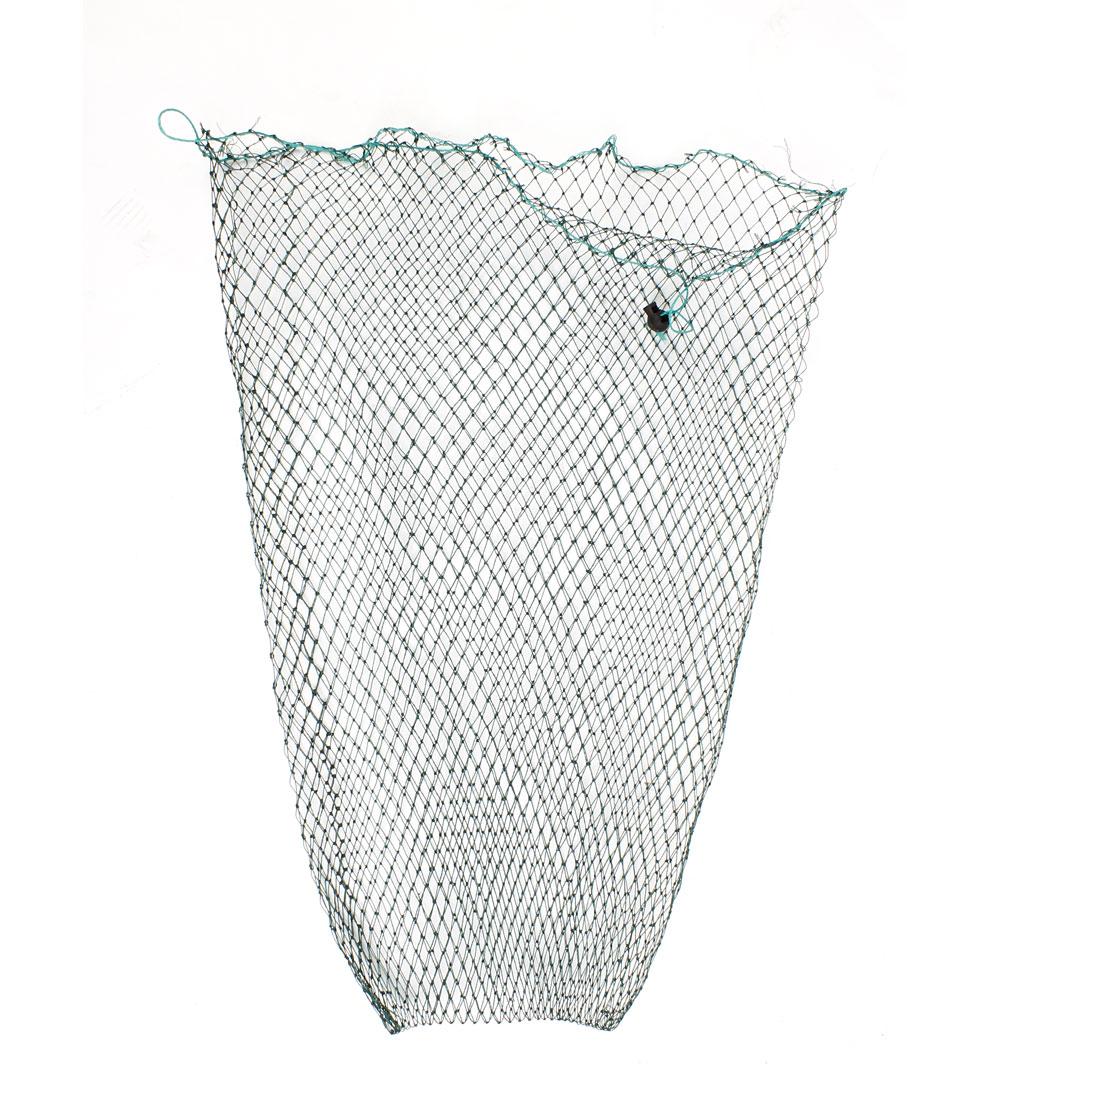 1cm x 1cm Rhombus Mesh Hole 40cm Mouth Girth 60cm Depth Green Nylon Crab Fishing Net Fish Stretch Holder